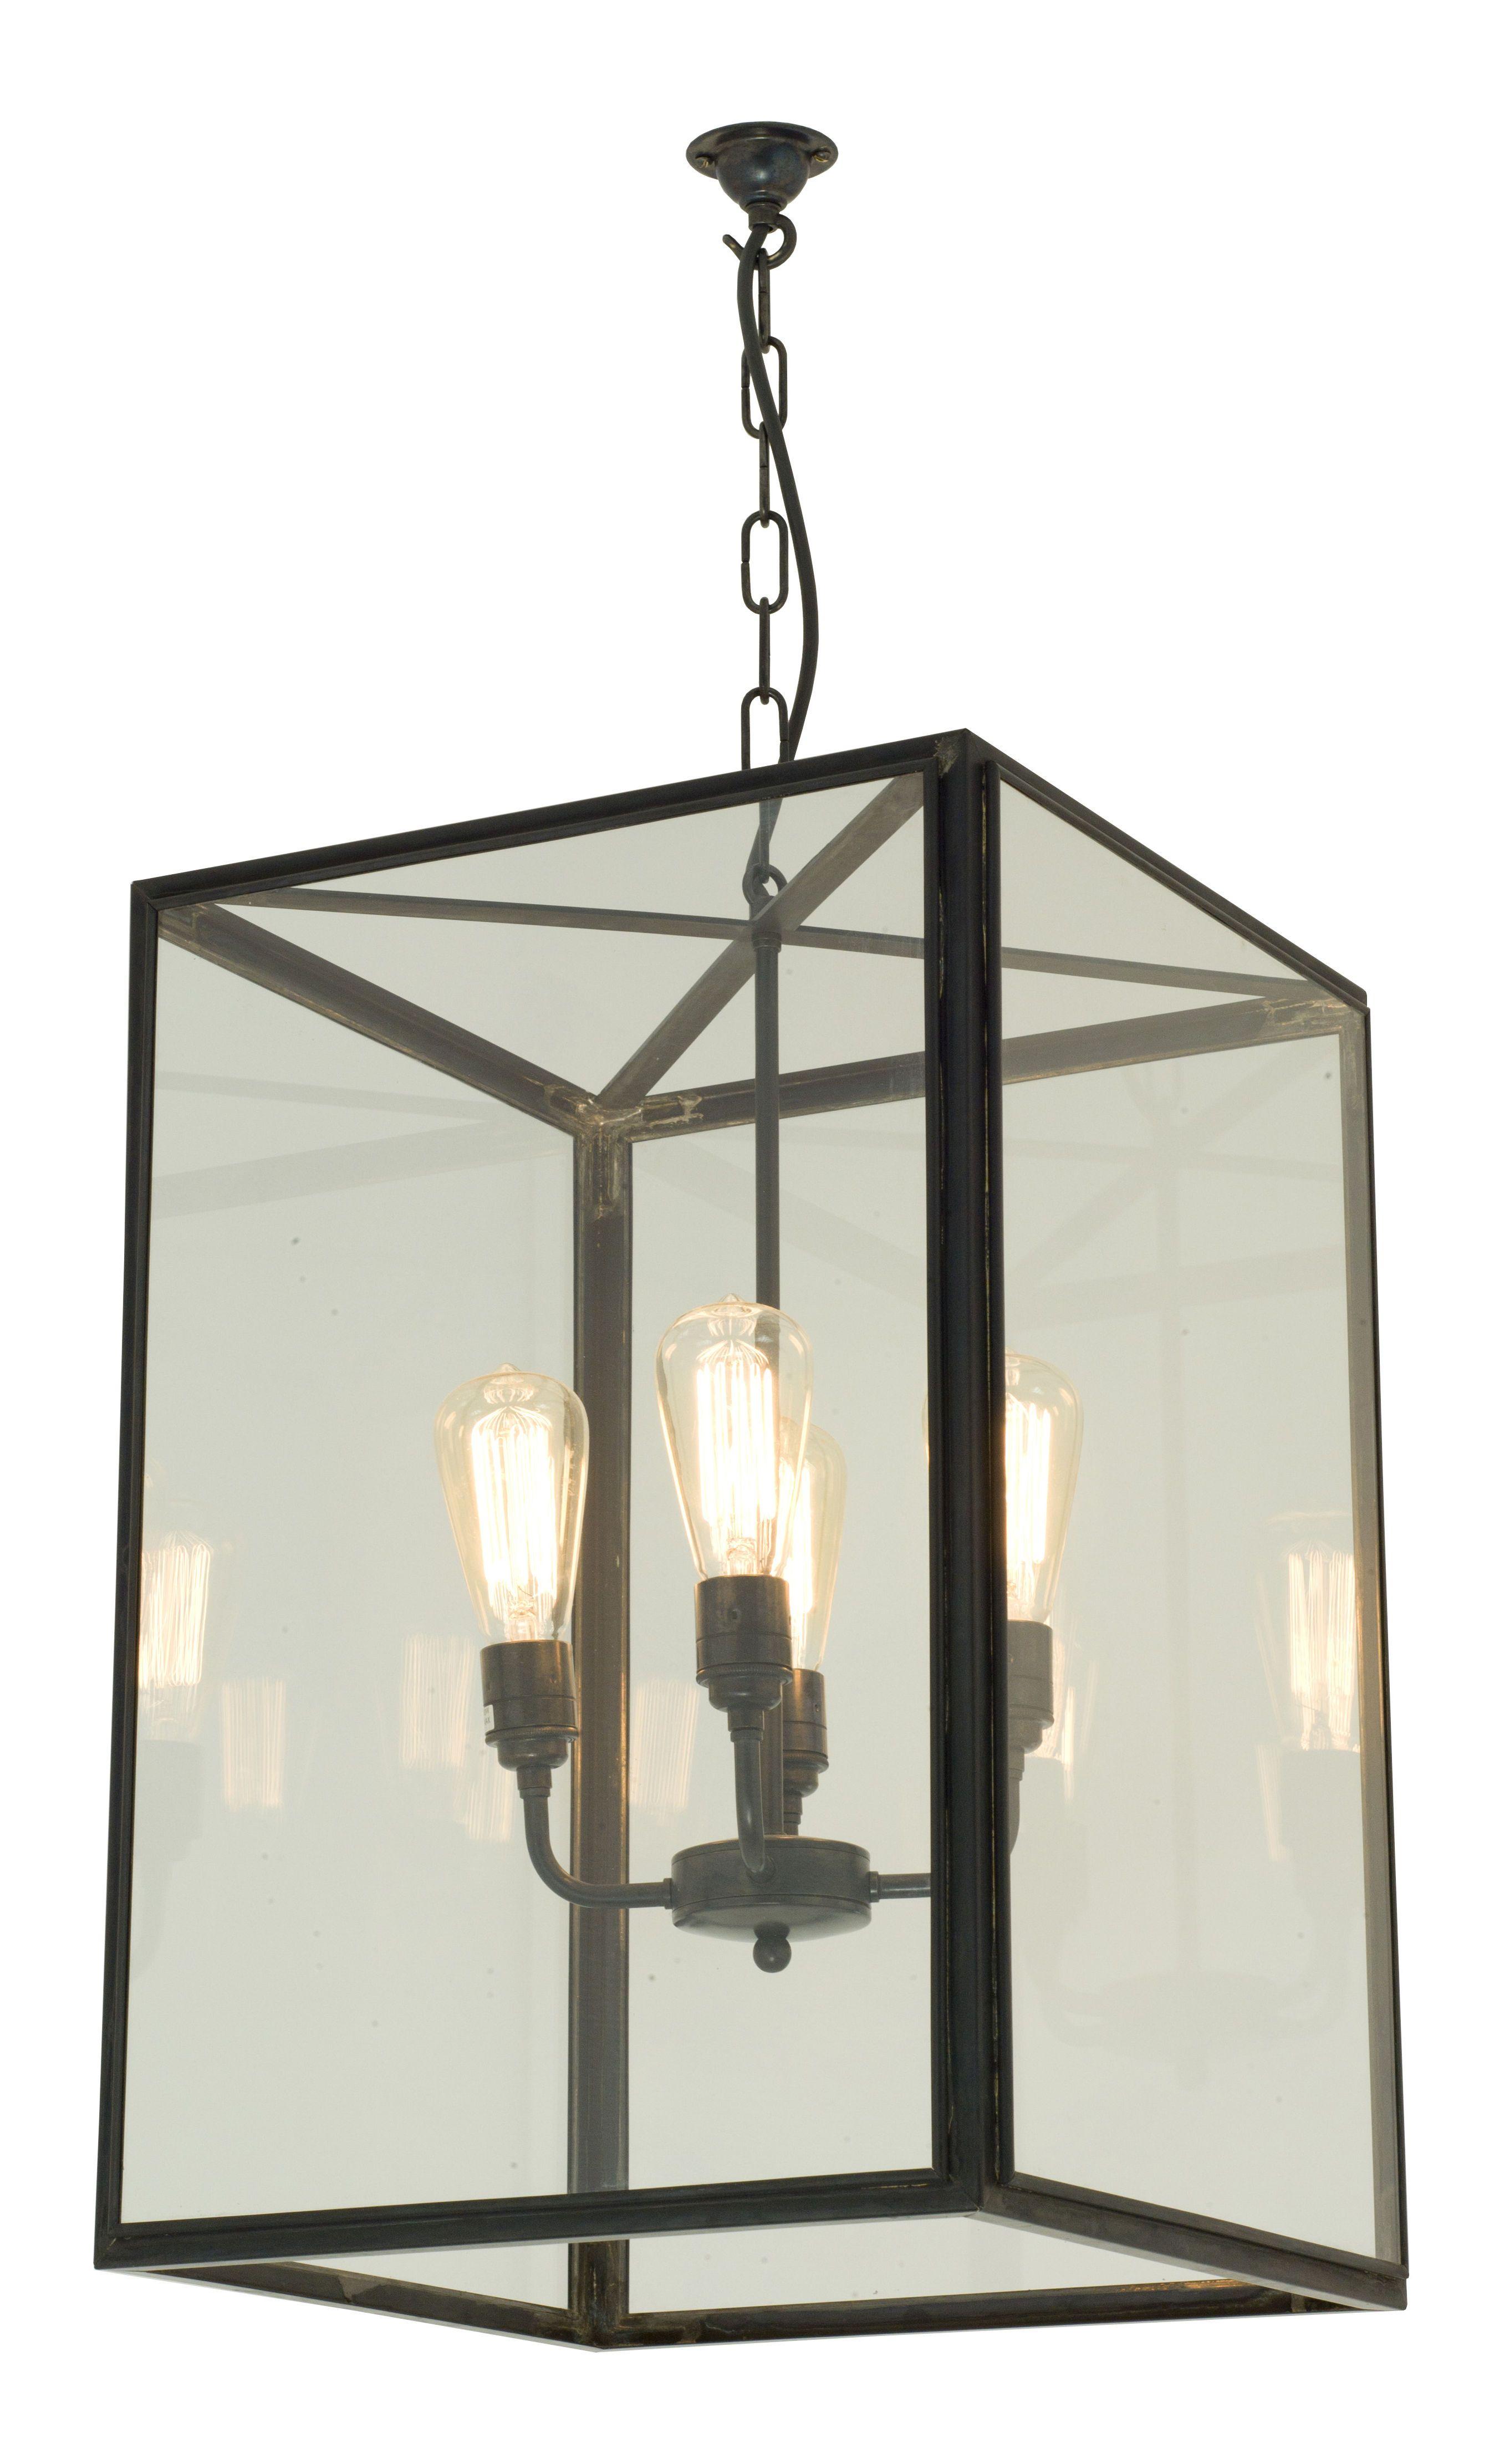 Box Pendant Lights Hall Pendants Lighting Classic Period Holloways Of Ludlow